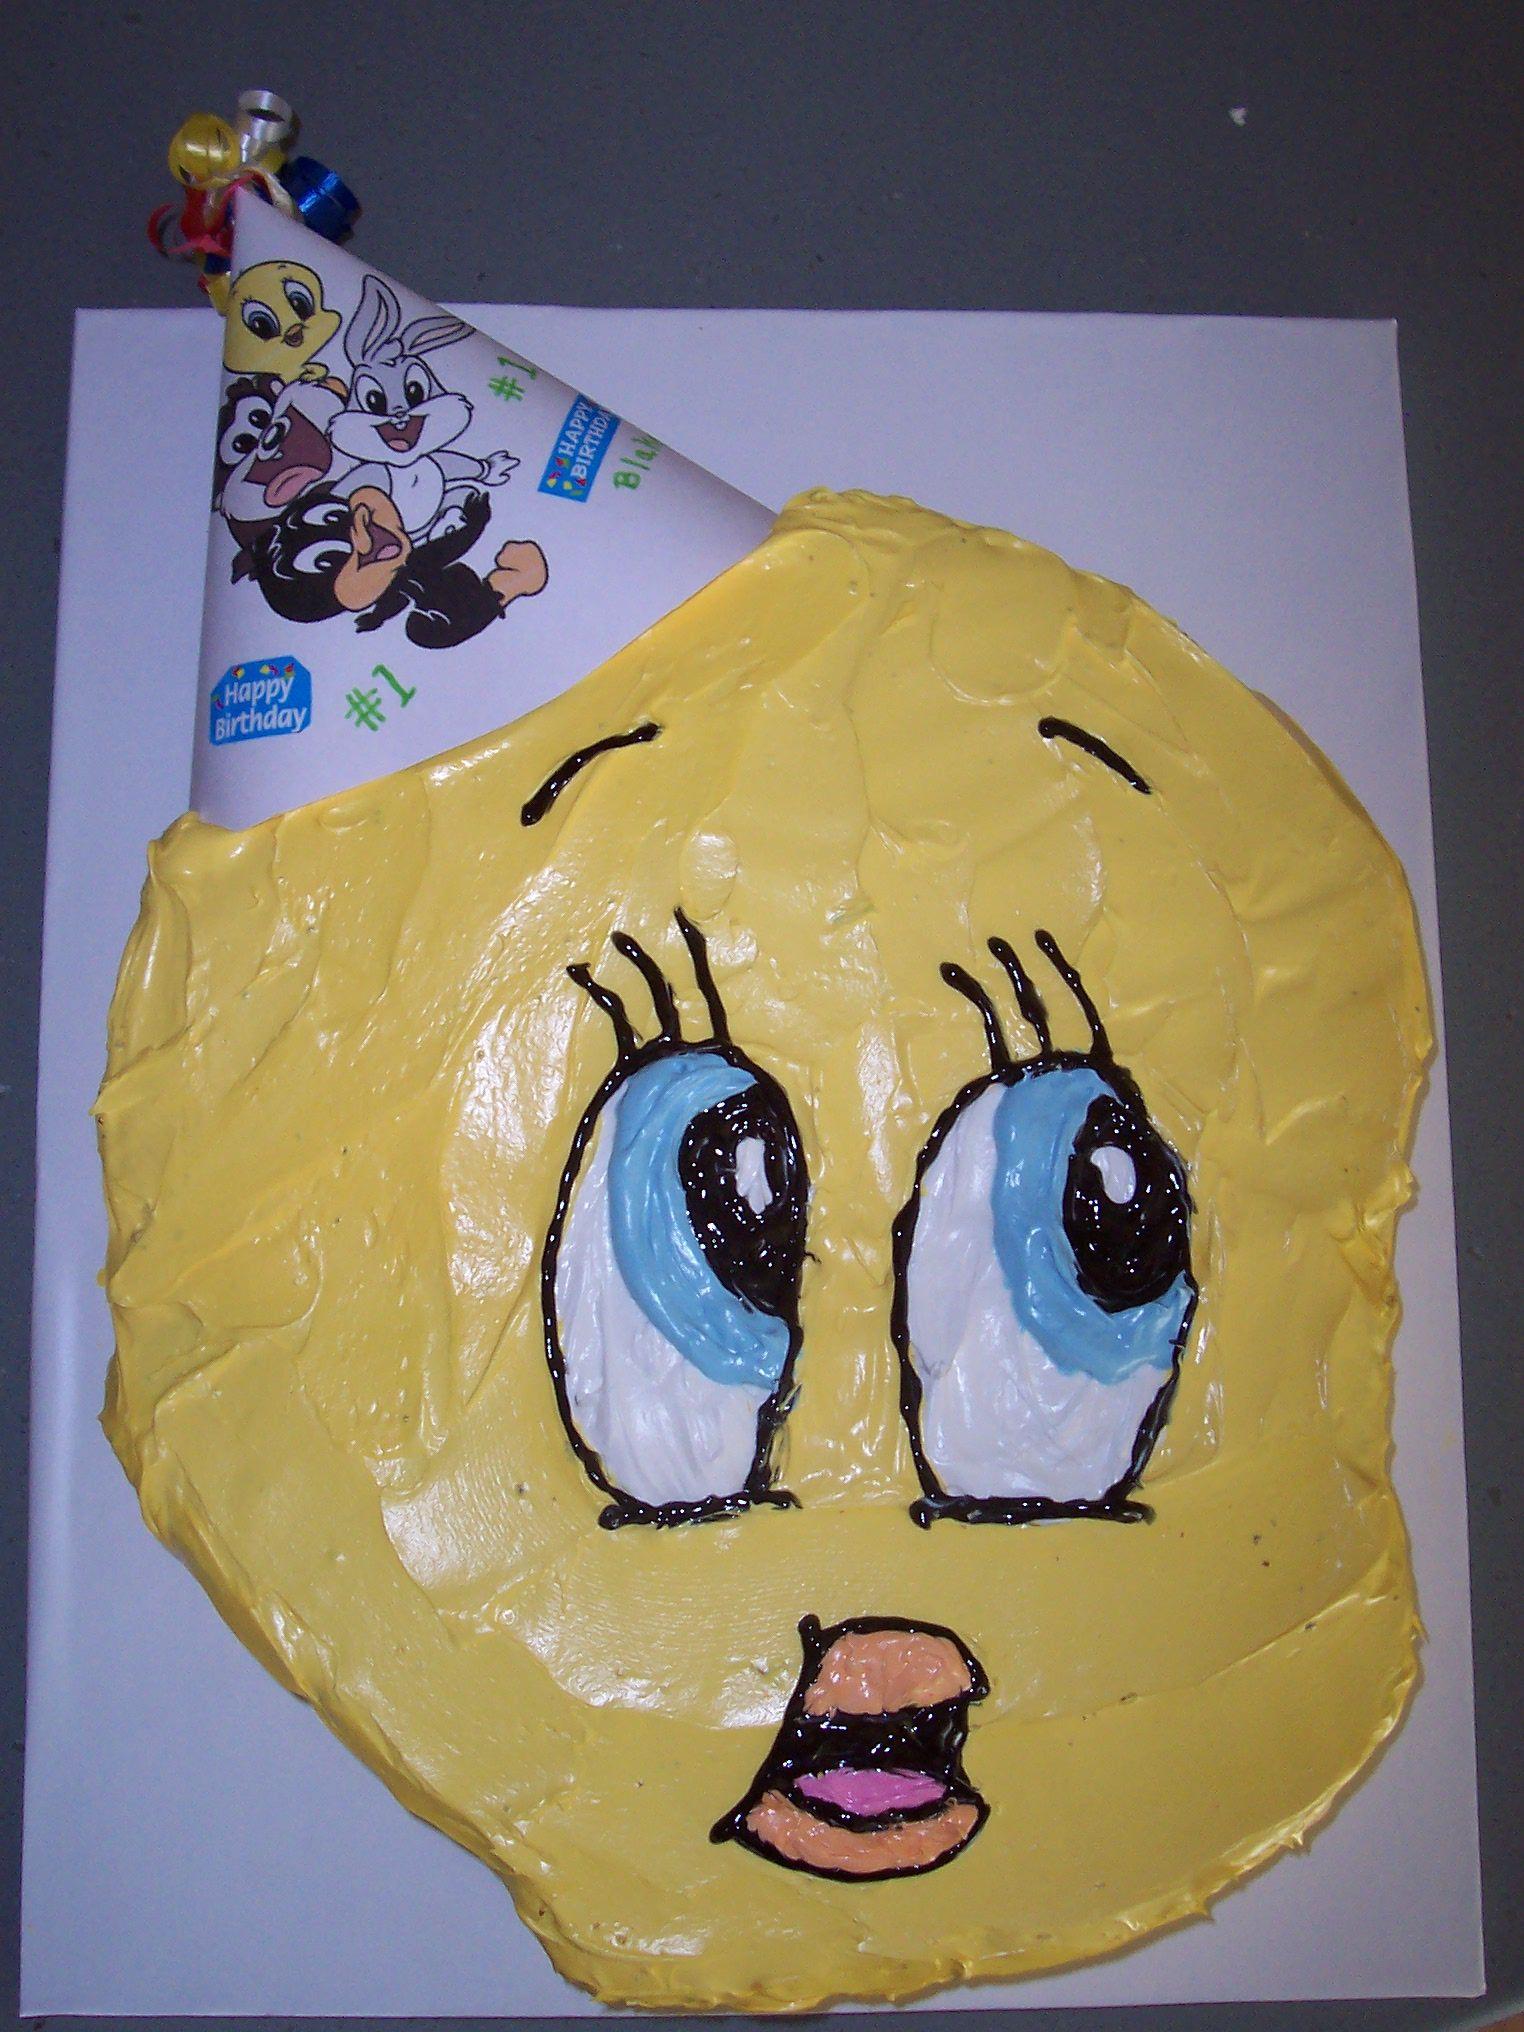 My 2nd son's 1st Birthday Cake! Baby Tweety